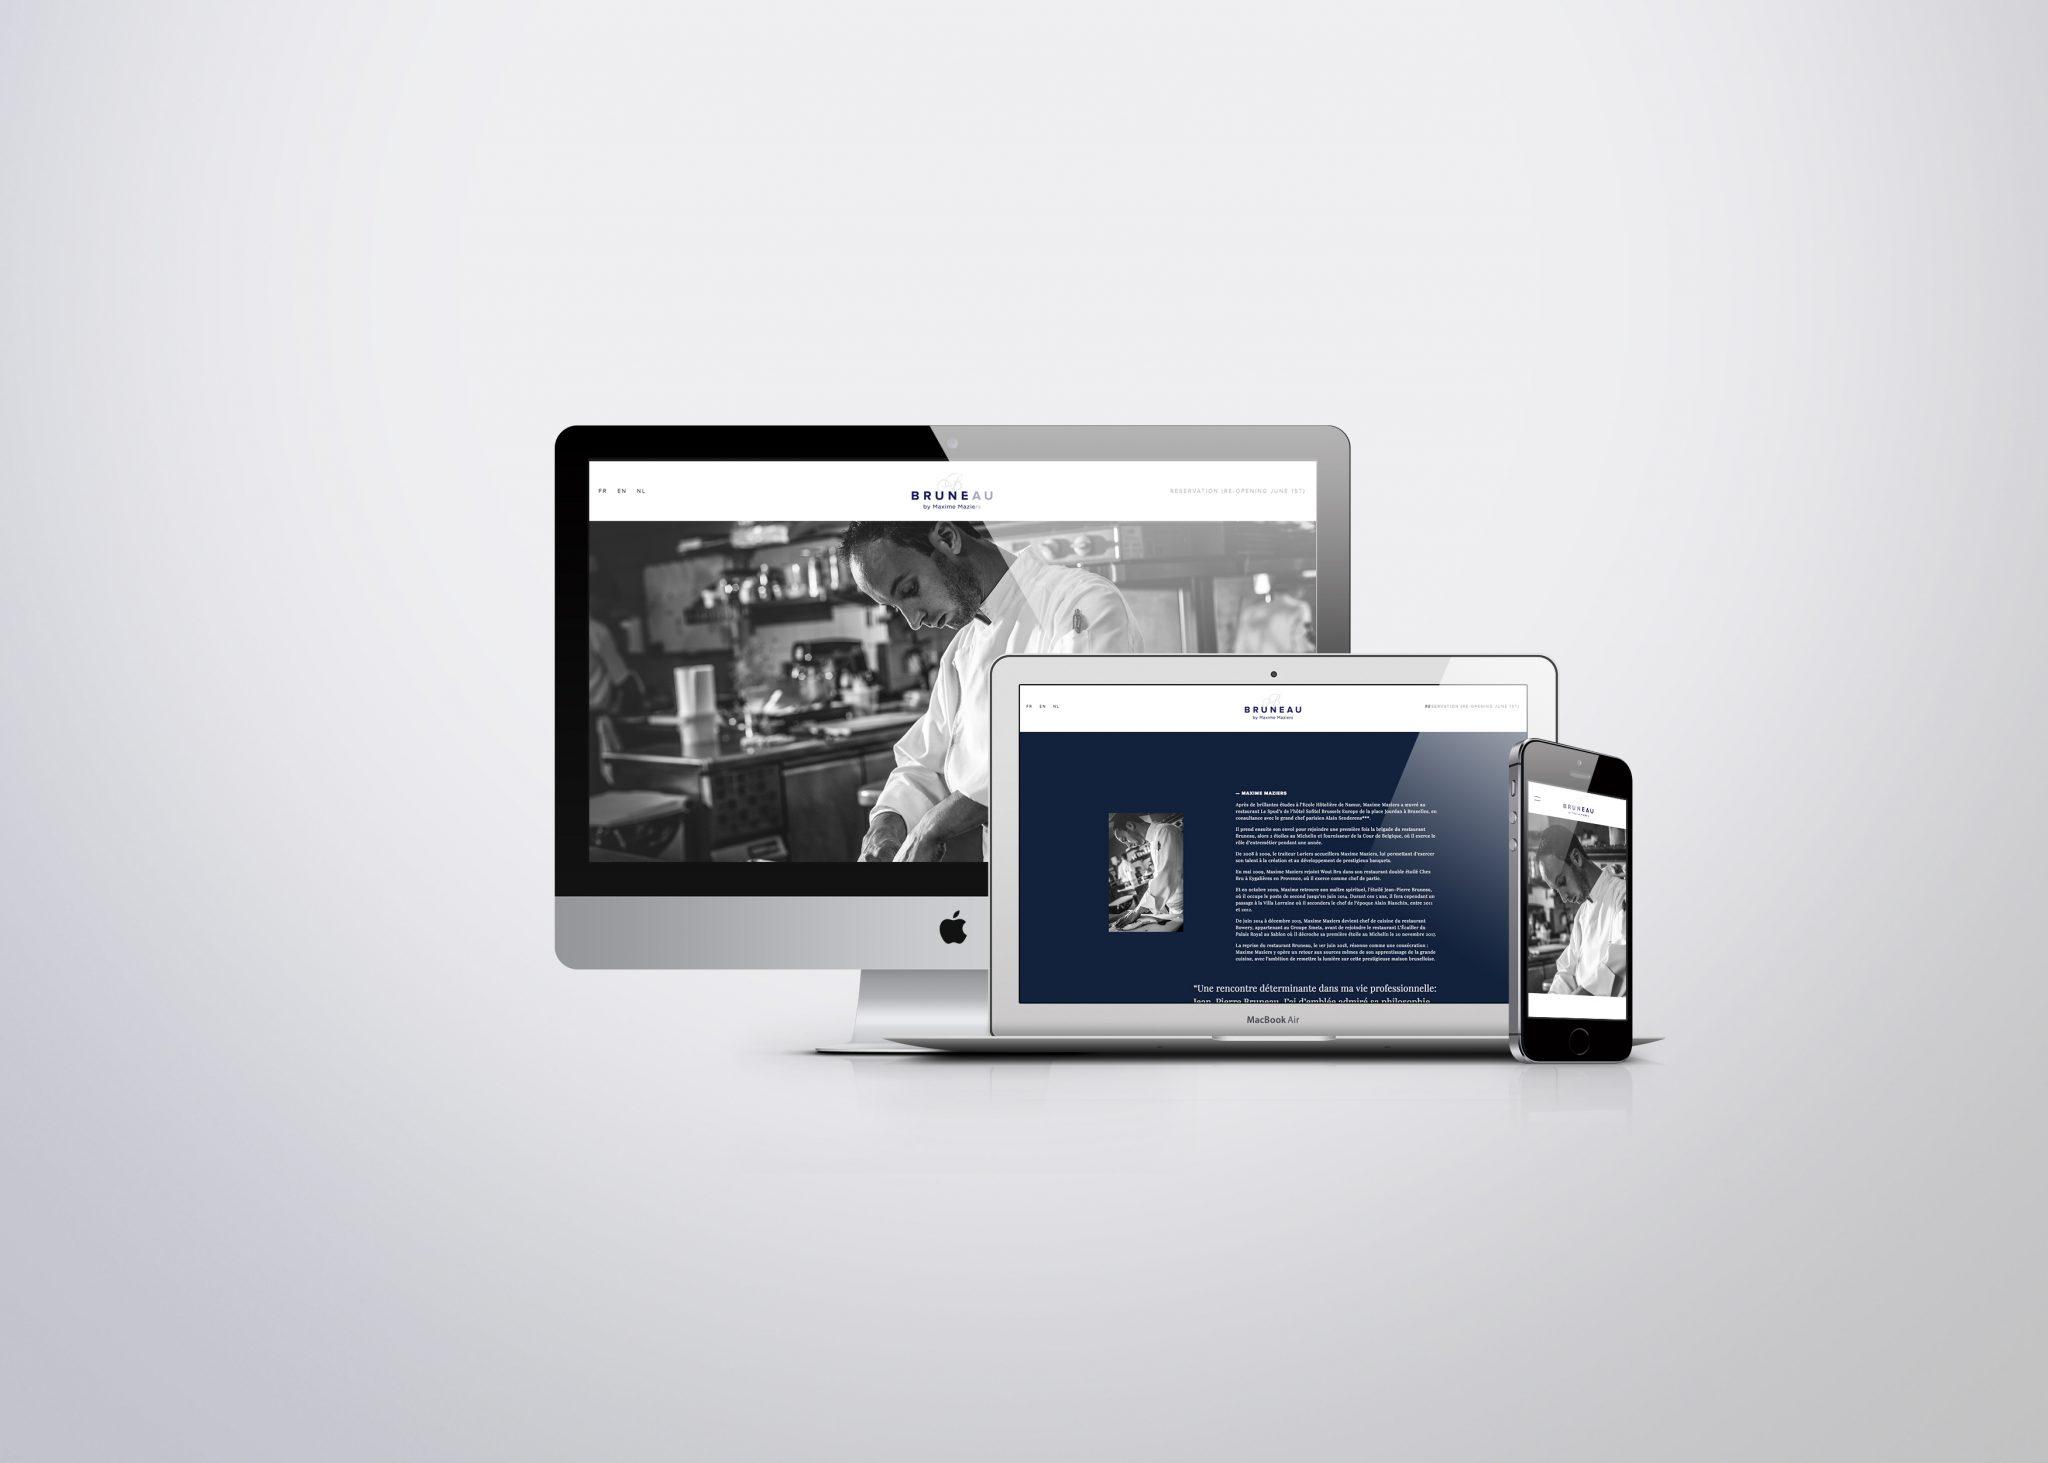 studio witvrouwen graphic design identity branding logotype logo Maxime Maziers chef restaurant web site